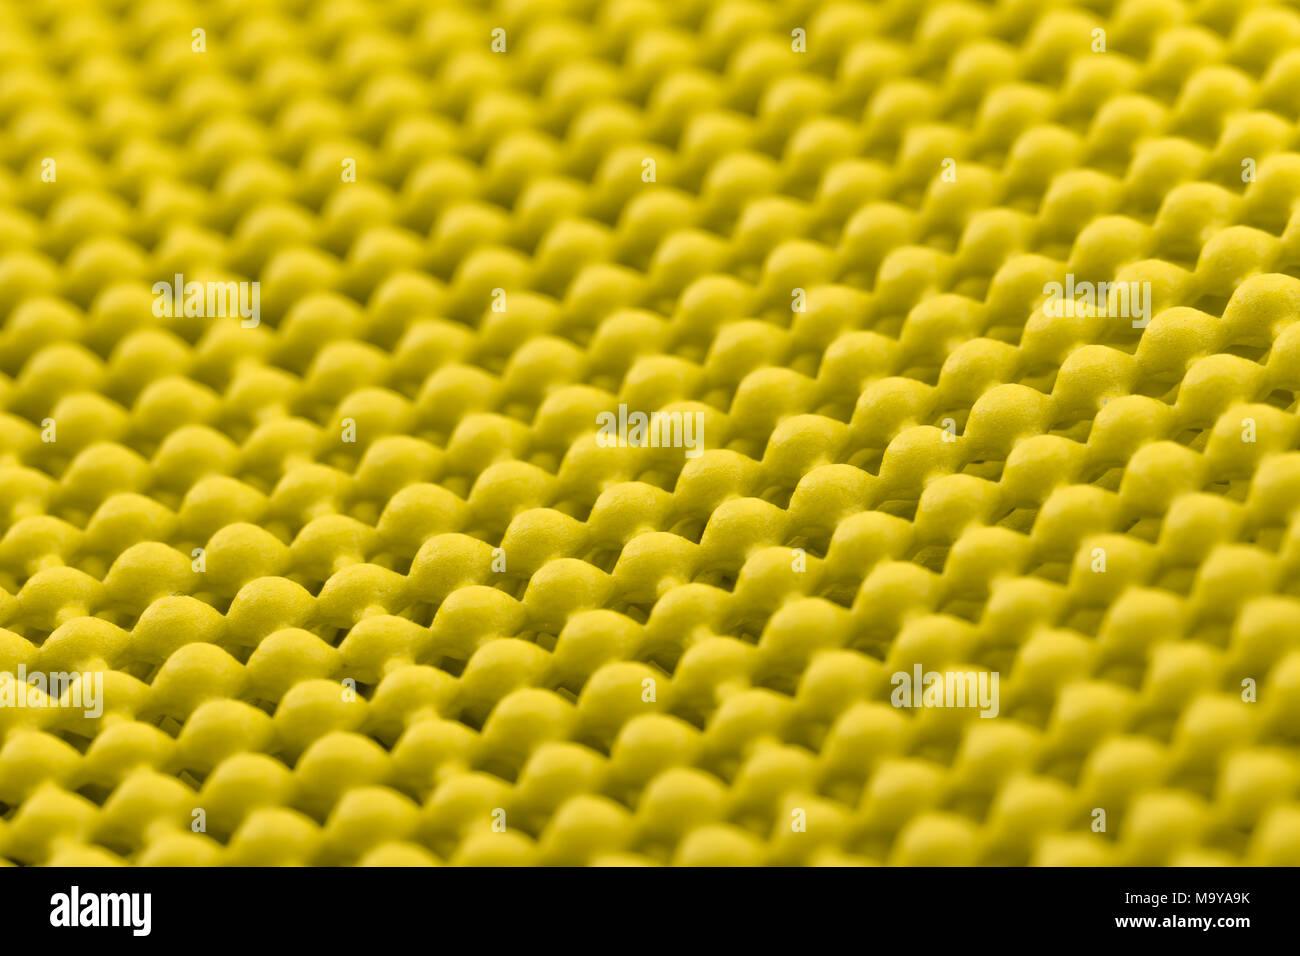 Close up detail of yellow skid mat Stock Photo